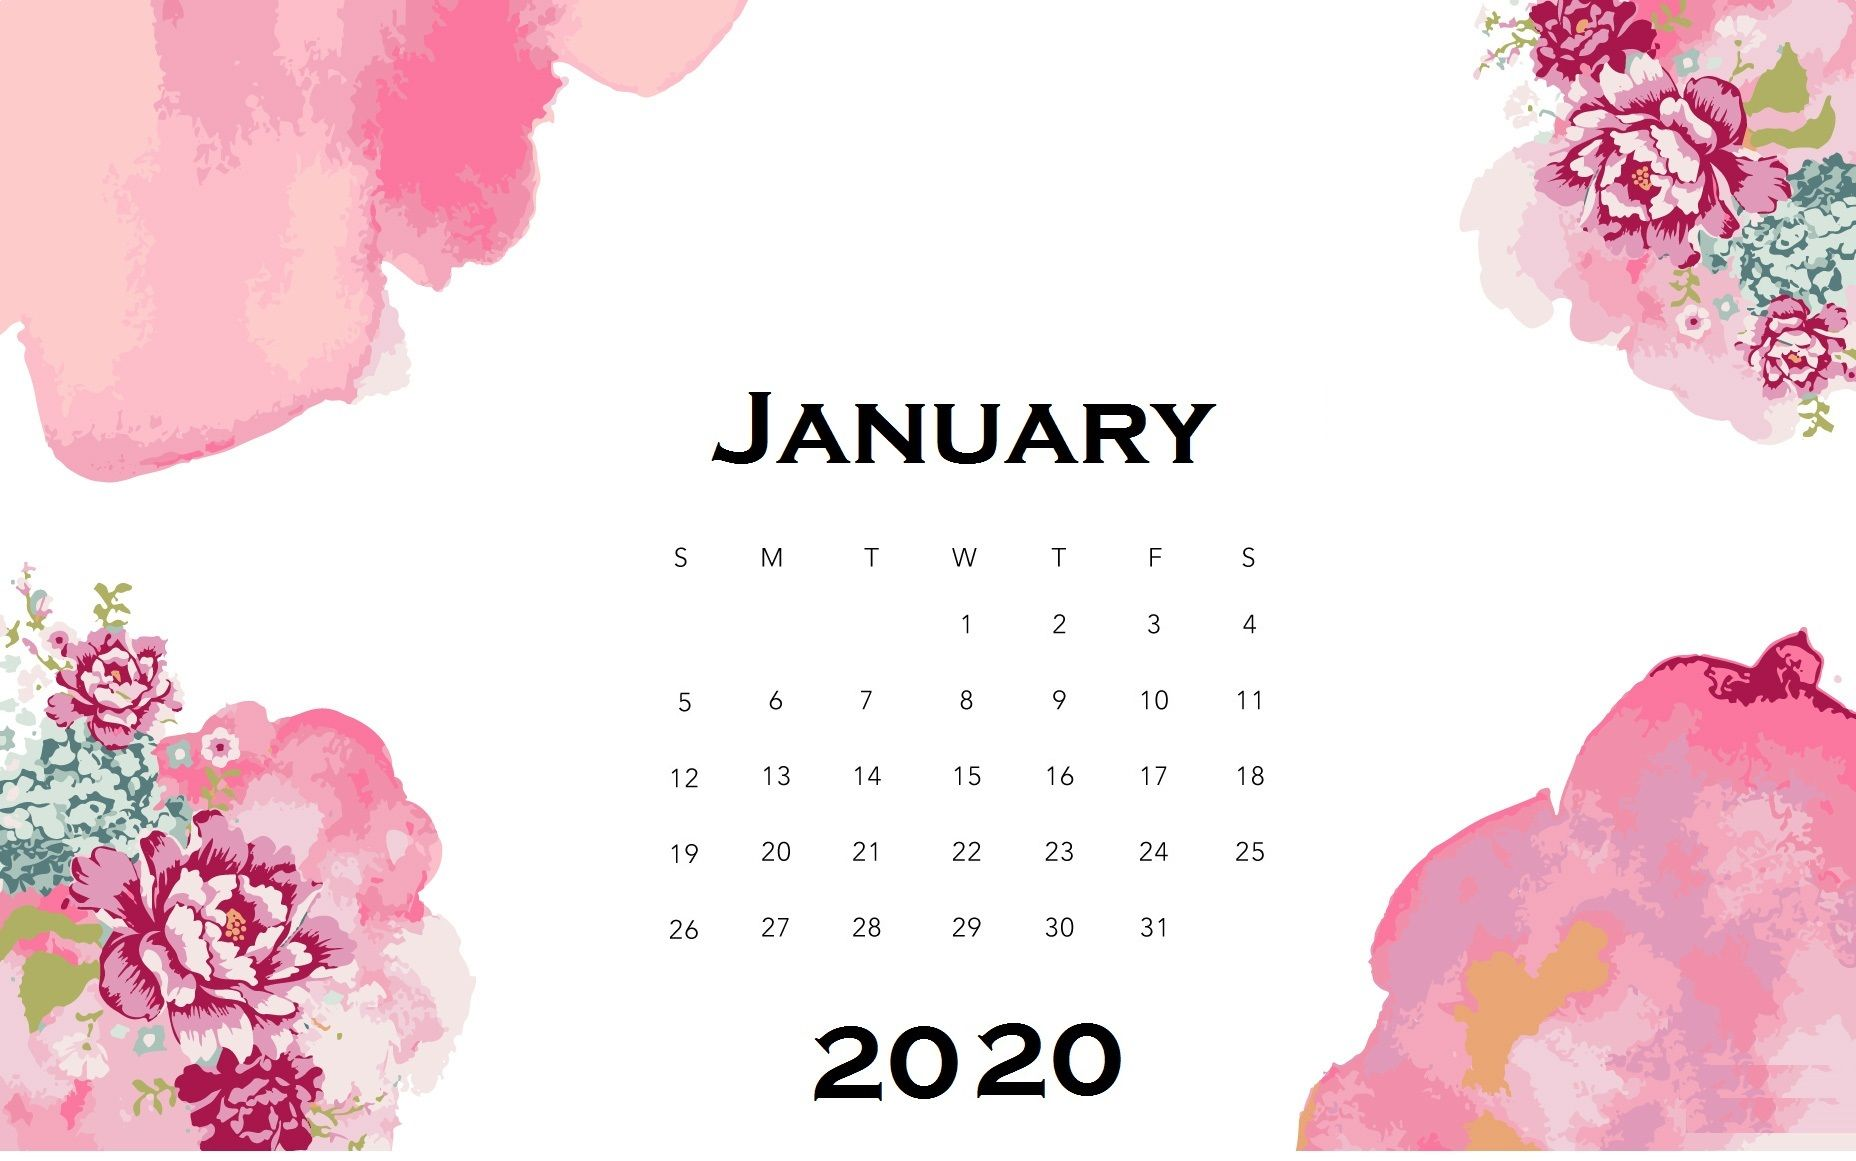 Floral january 2020 desk calendar calendar wallpaper